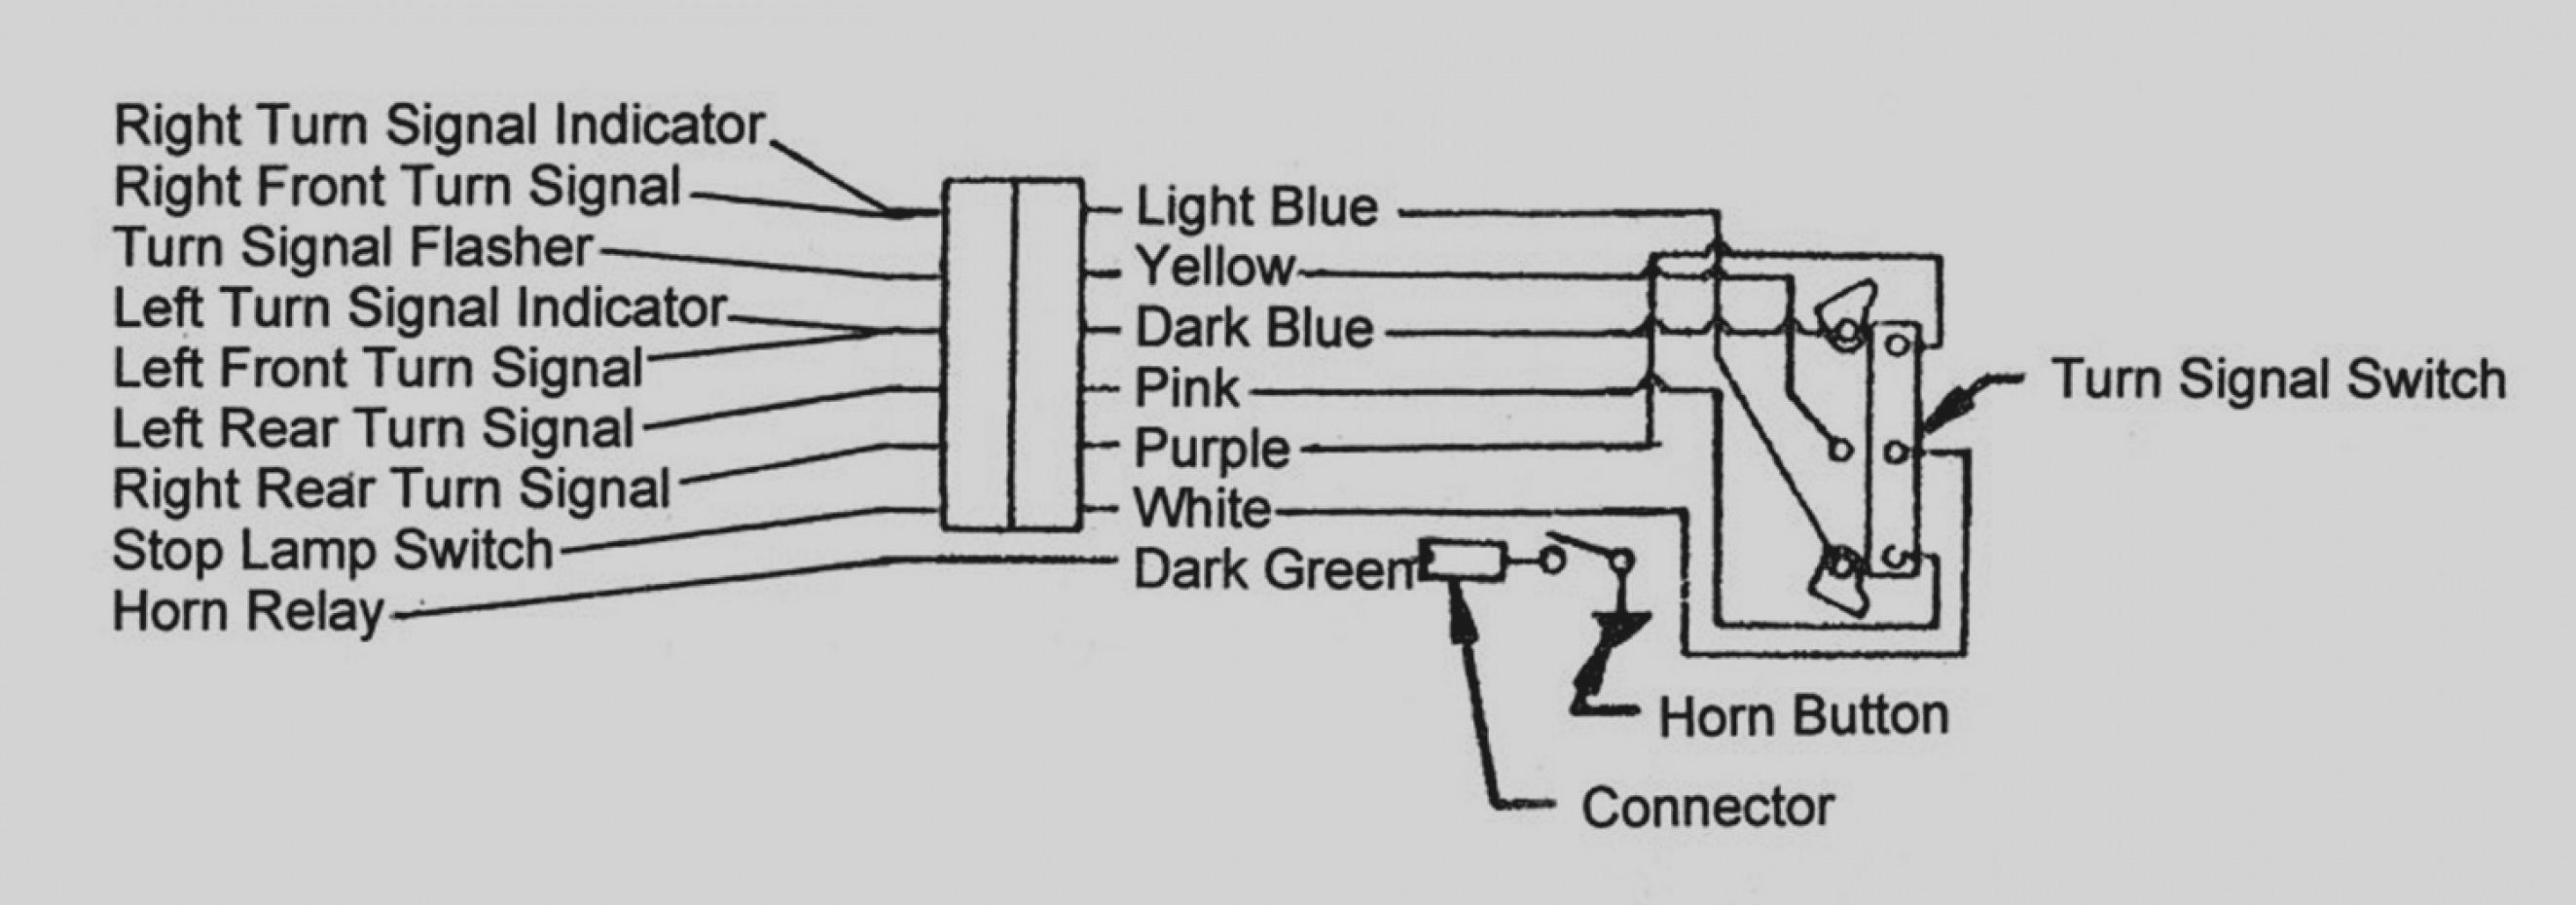 turn signal wiring diagram gm - 1987 ford ltd fuse box diagram for wiring  diagram schematics  wiring diagram schematics